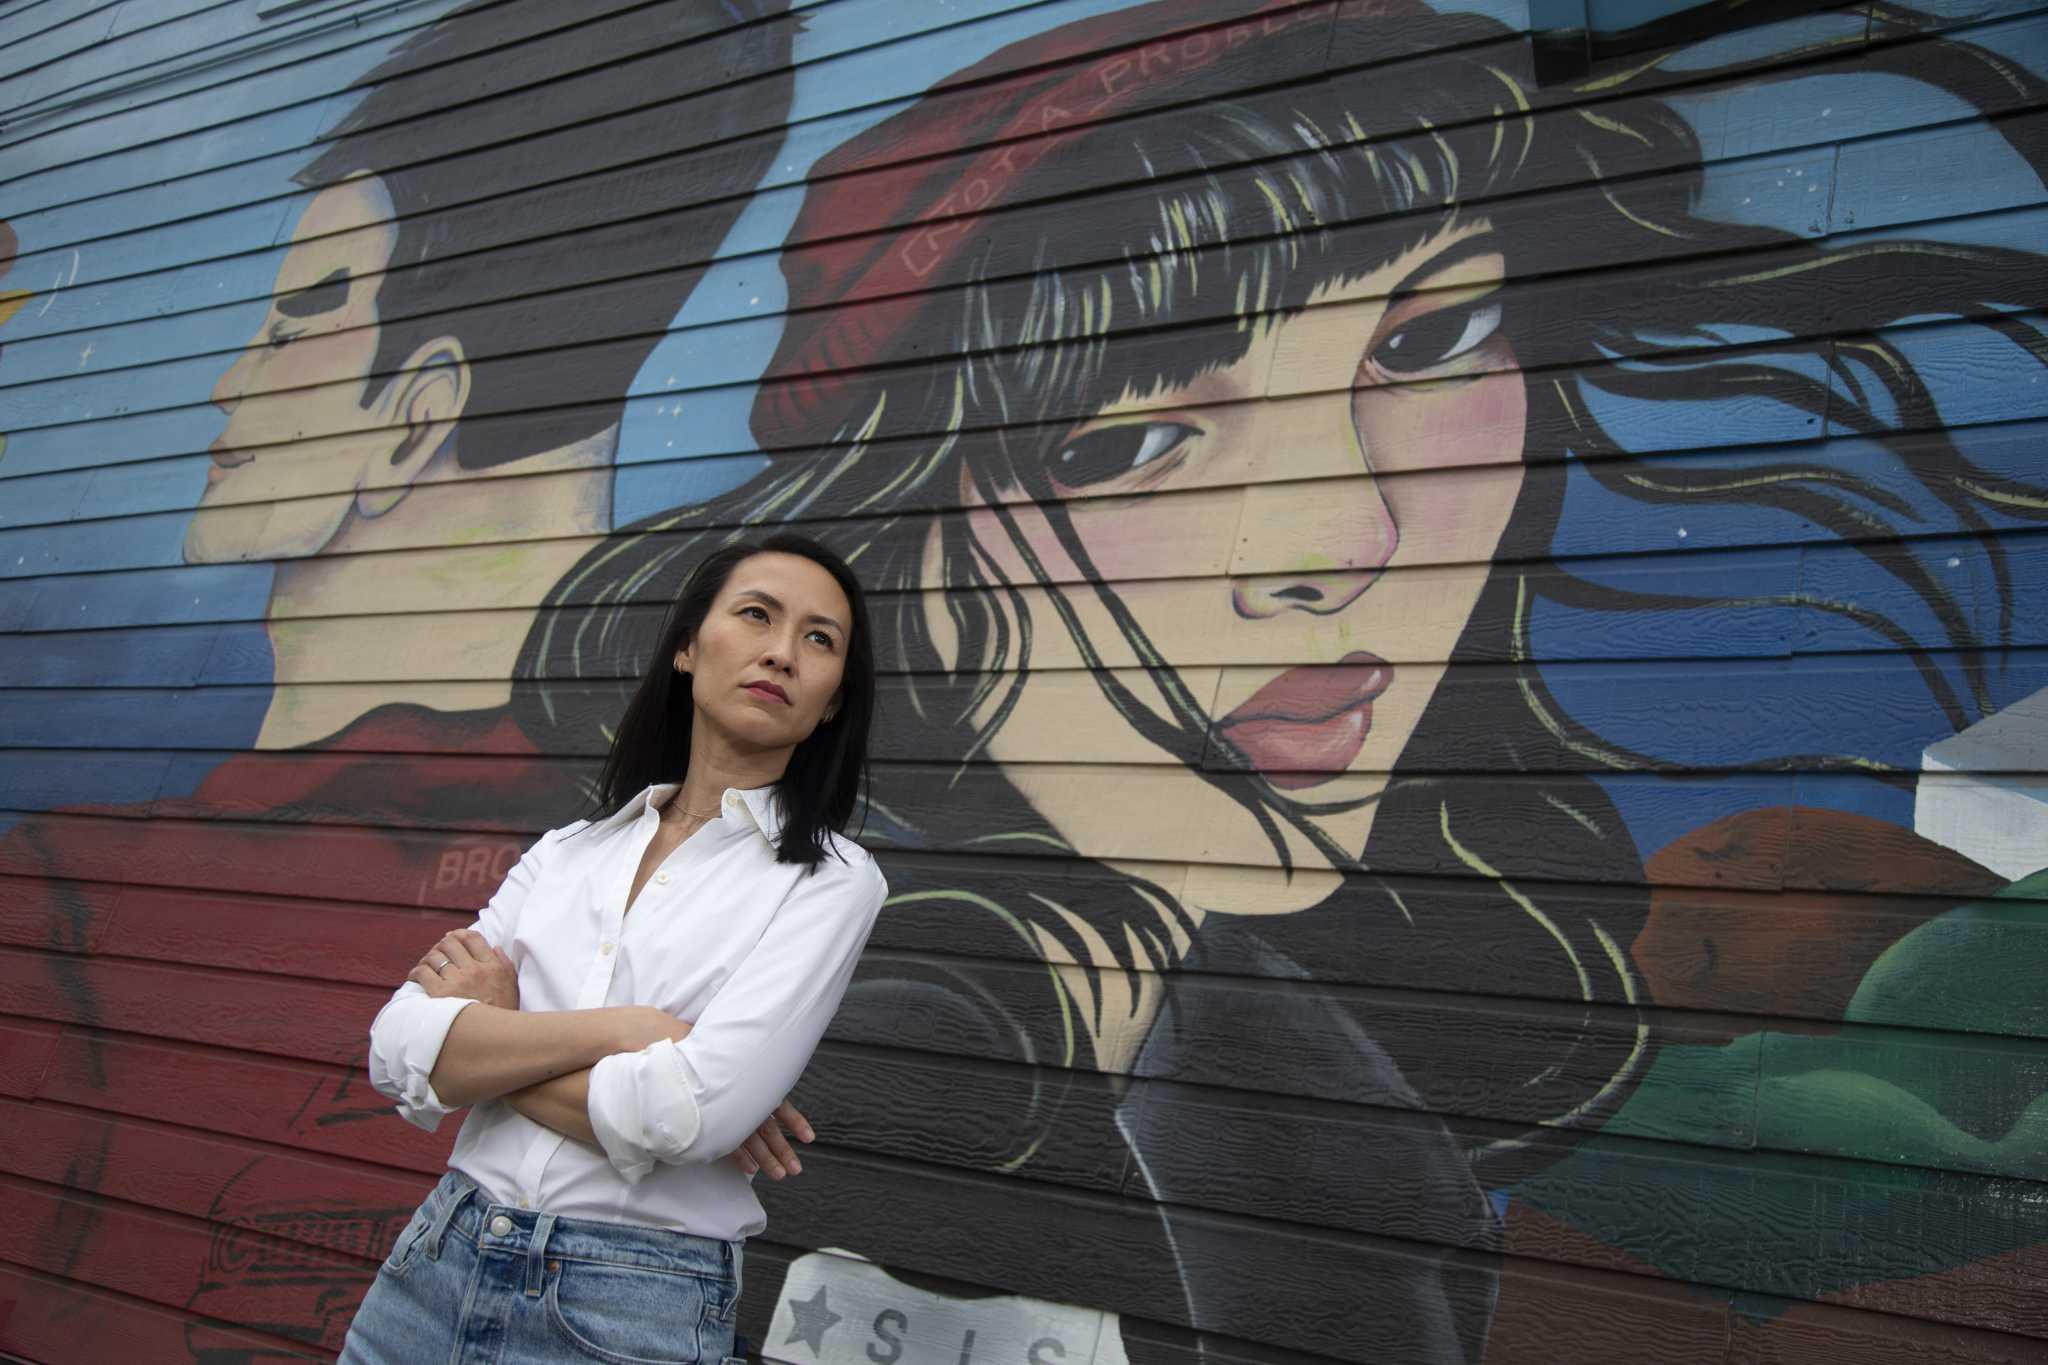 www.houstonchronicle.com: Meet six Asian American changemakers shaping Houston's future